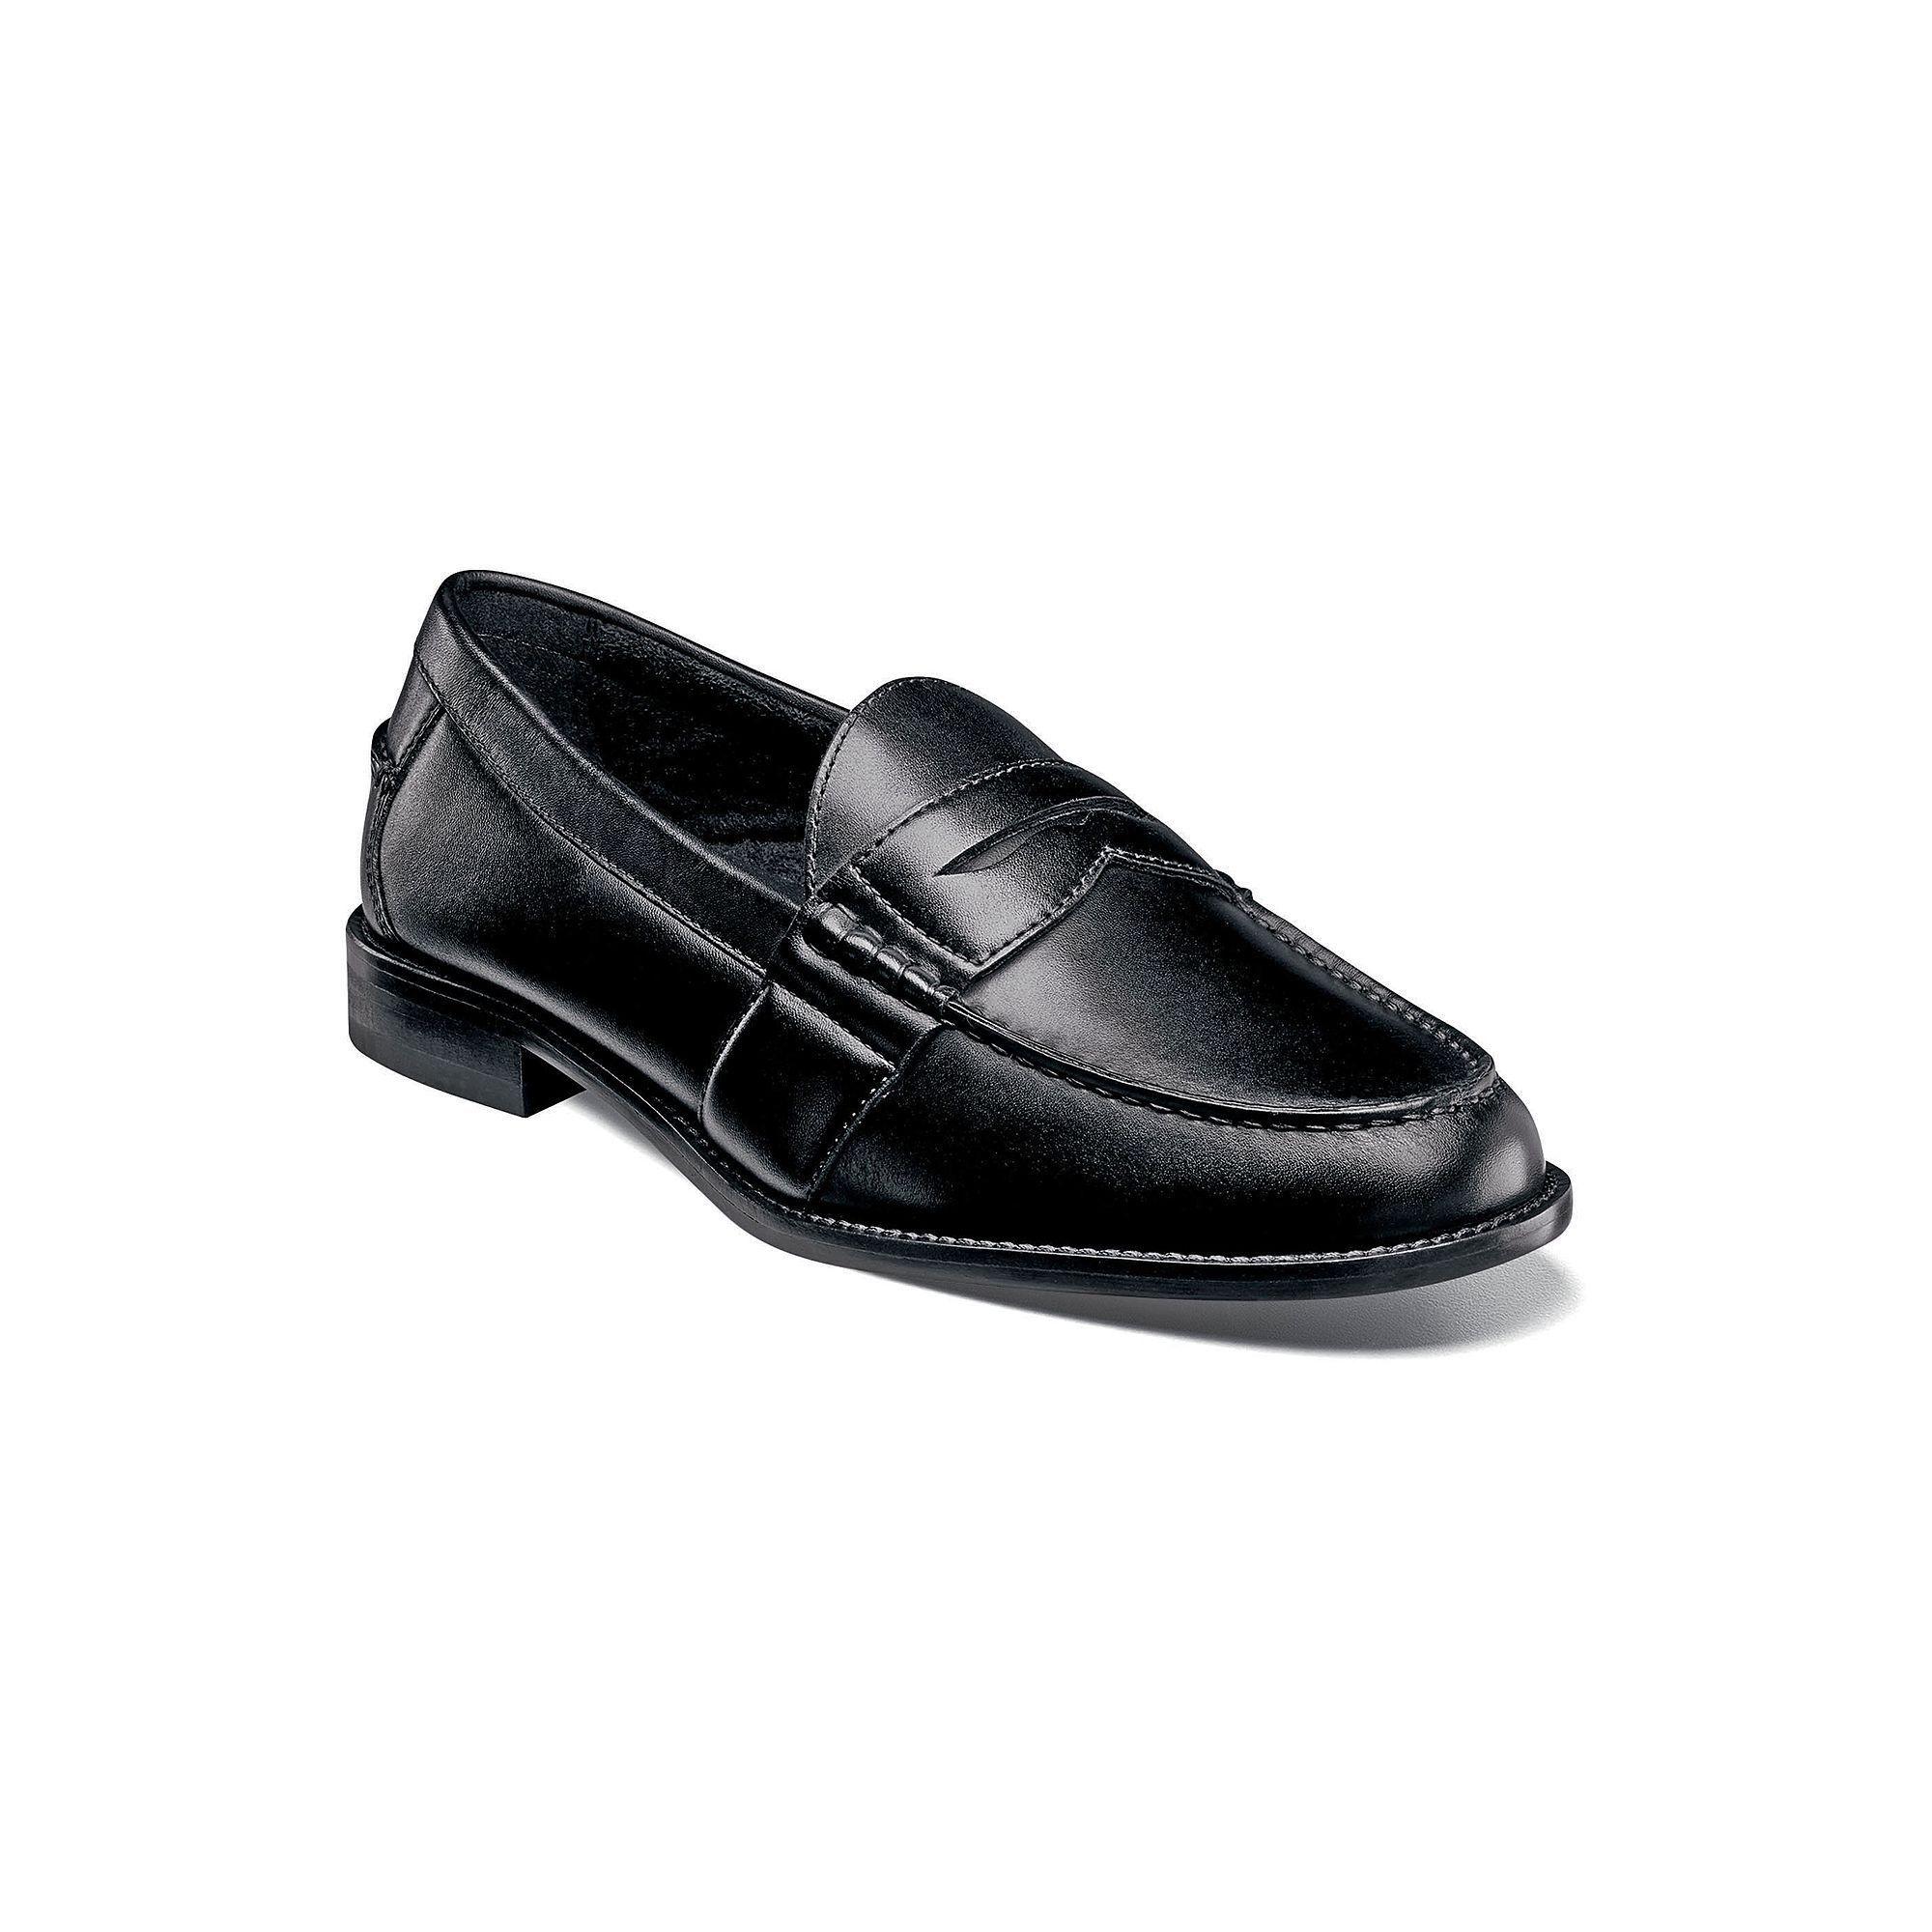 Black · Nunn Bush Noah Men's Leather Penny Loafers ...